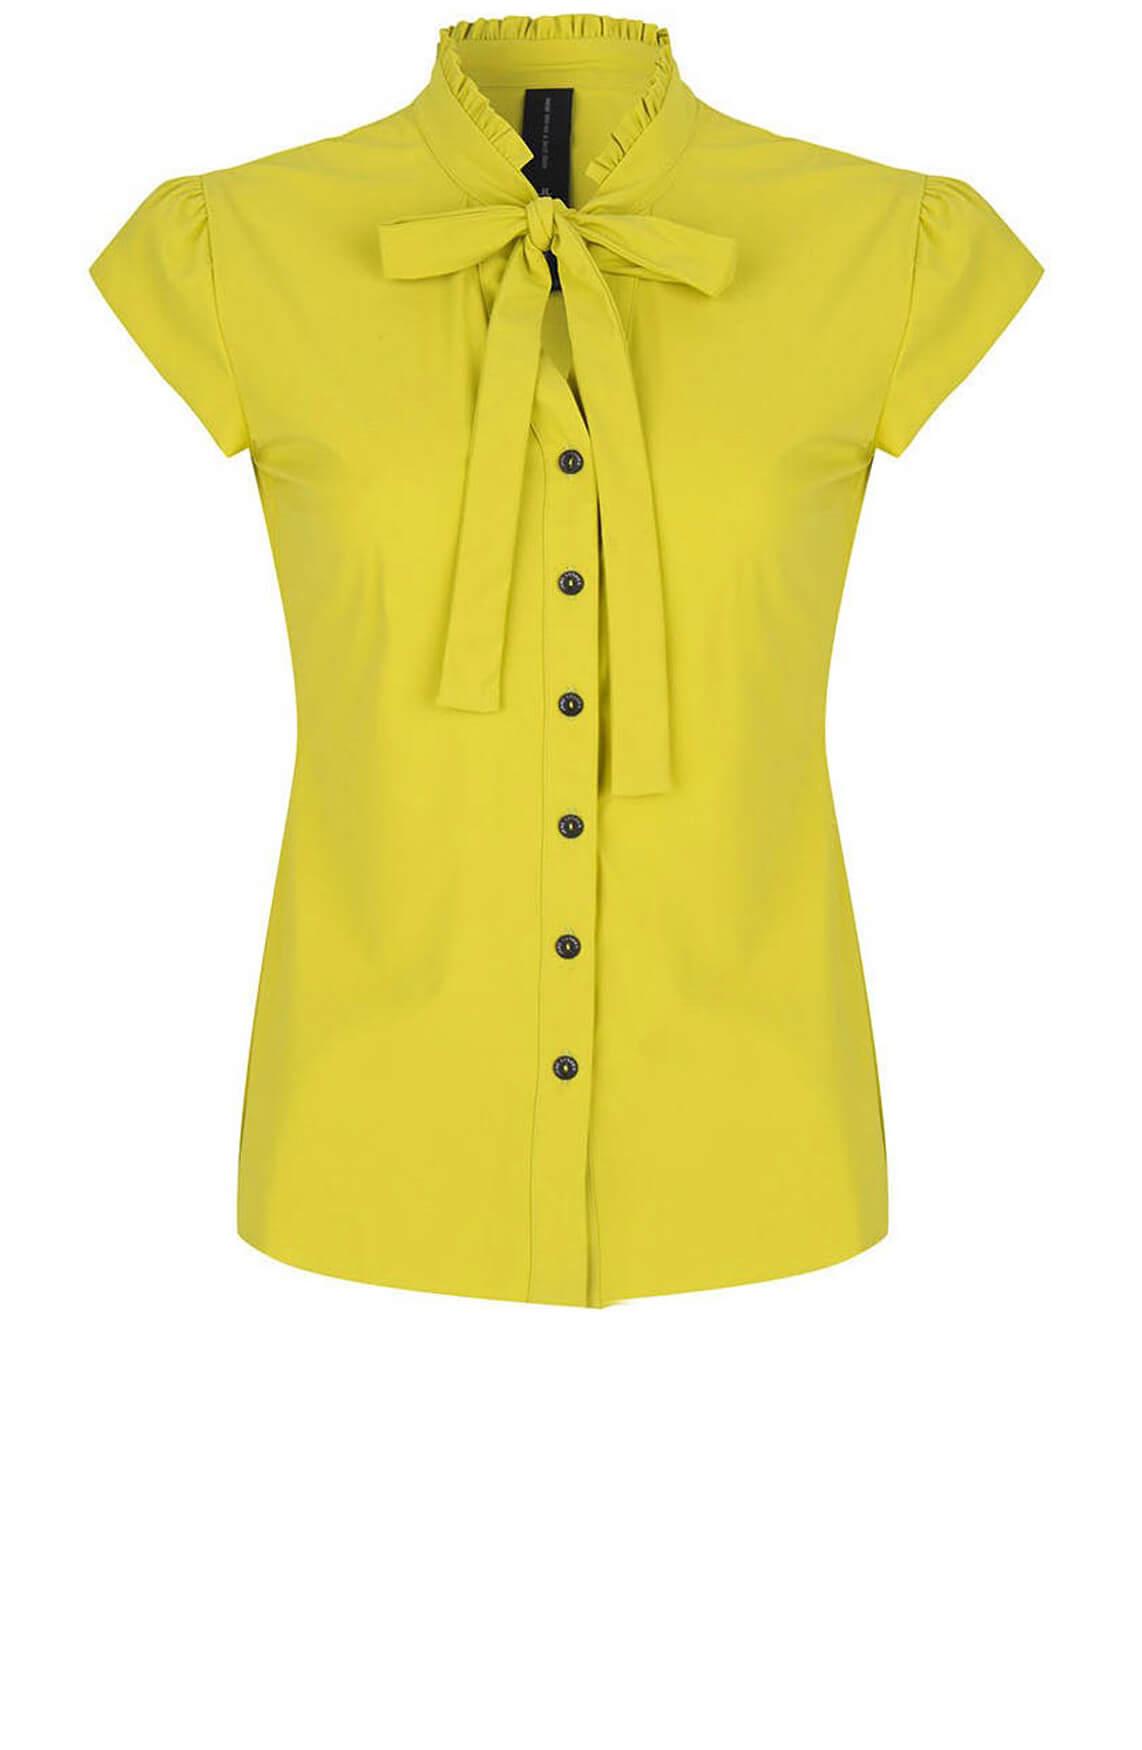 Jane Lushka Dames Blouse met striksluiting geel